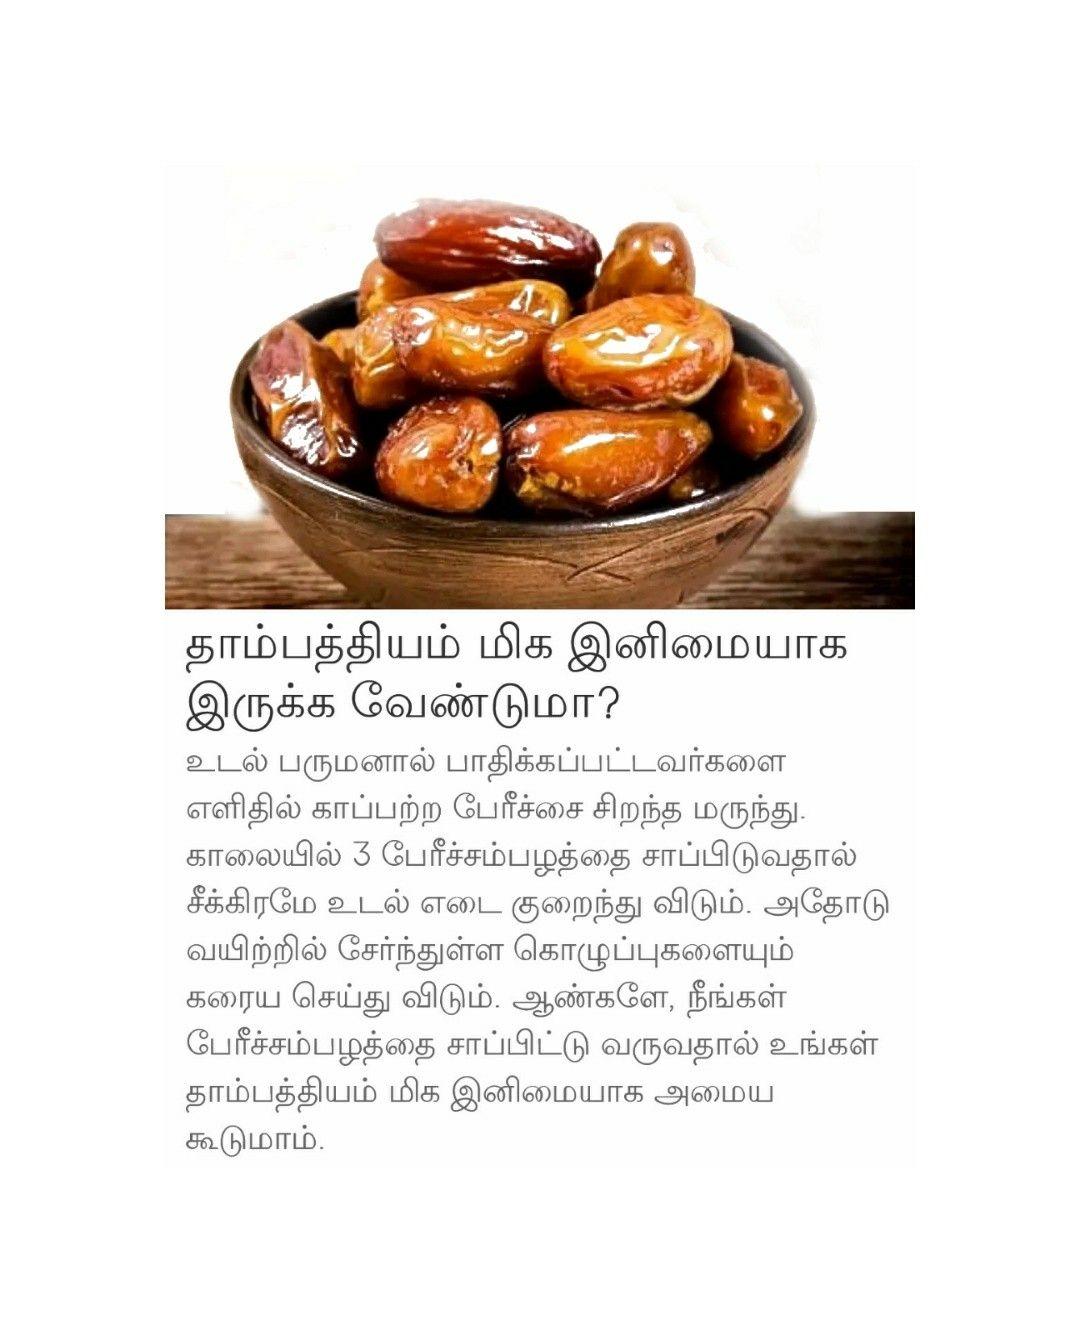 Pin by Vasu, Chittoor on Tamil, Vasu, Chittoor Health